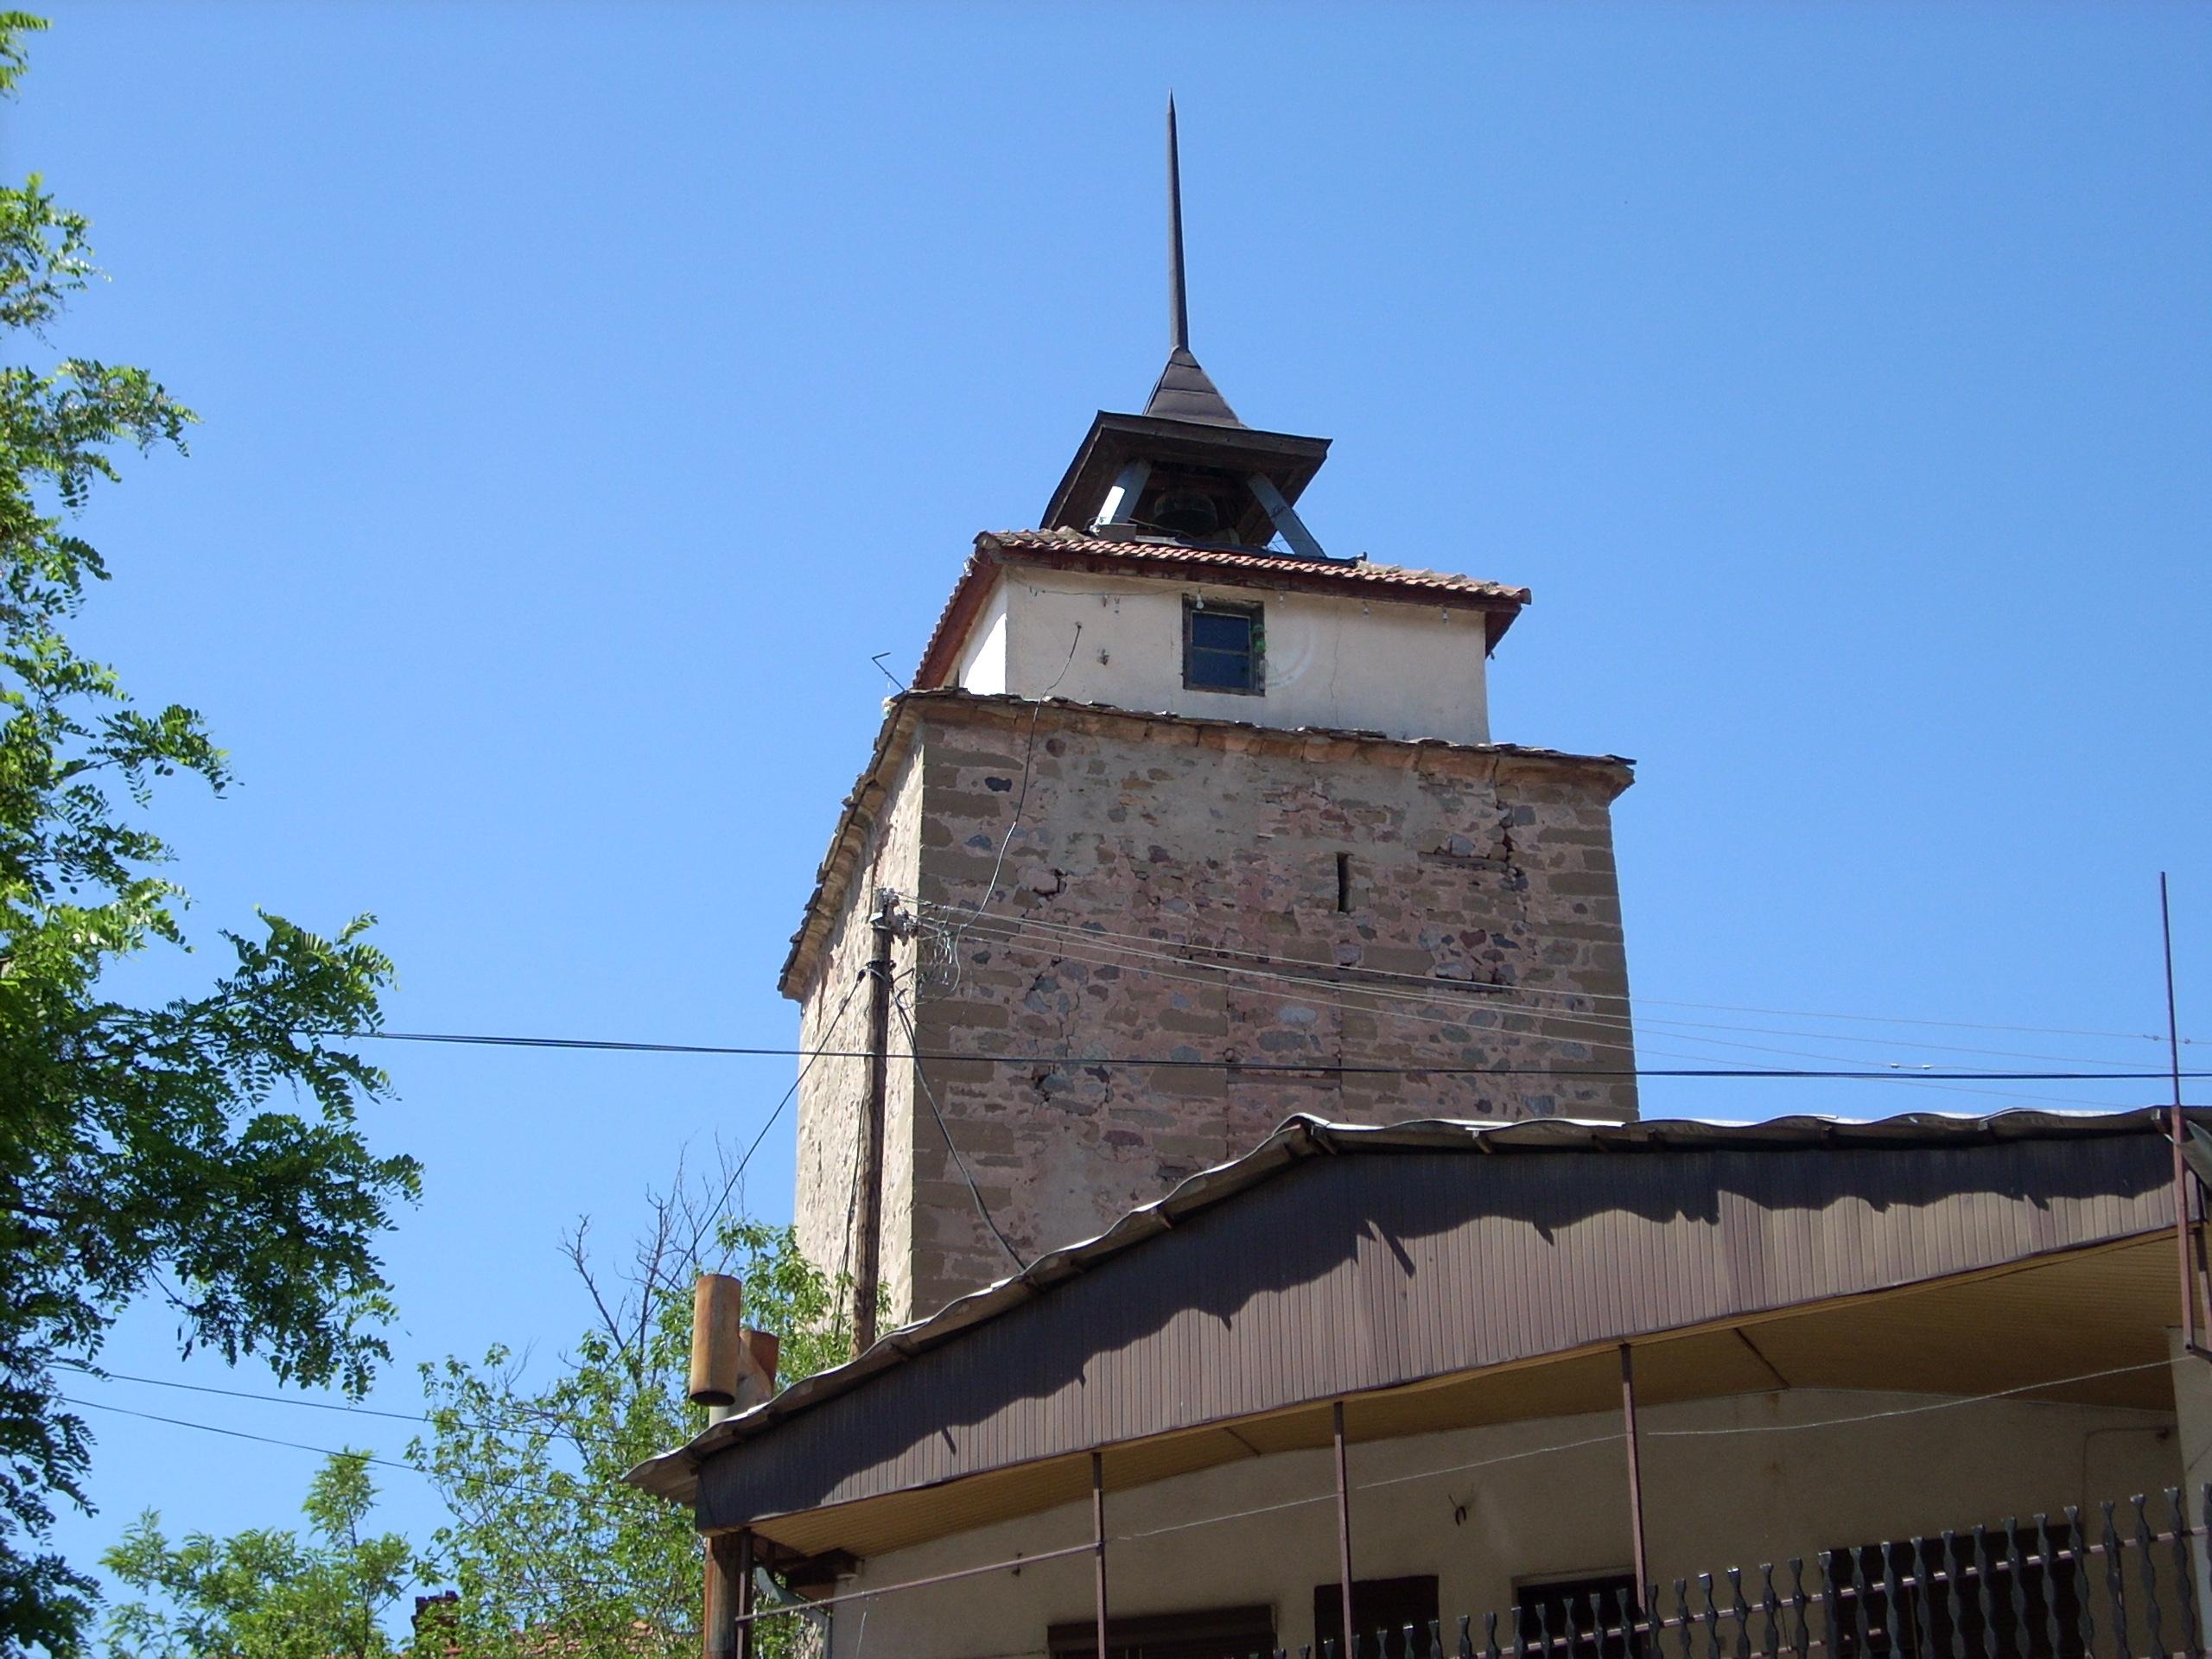 Stip - clock tower